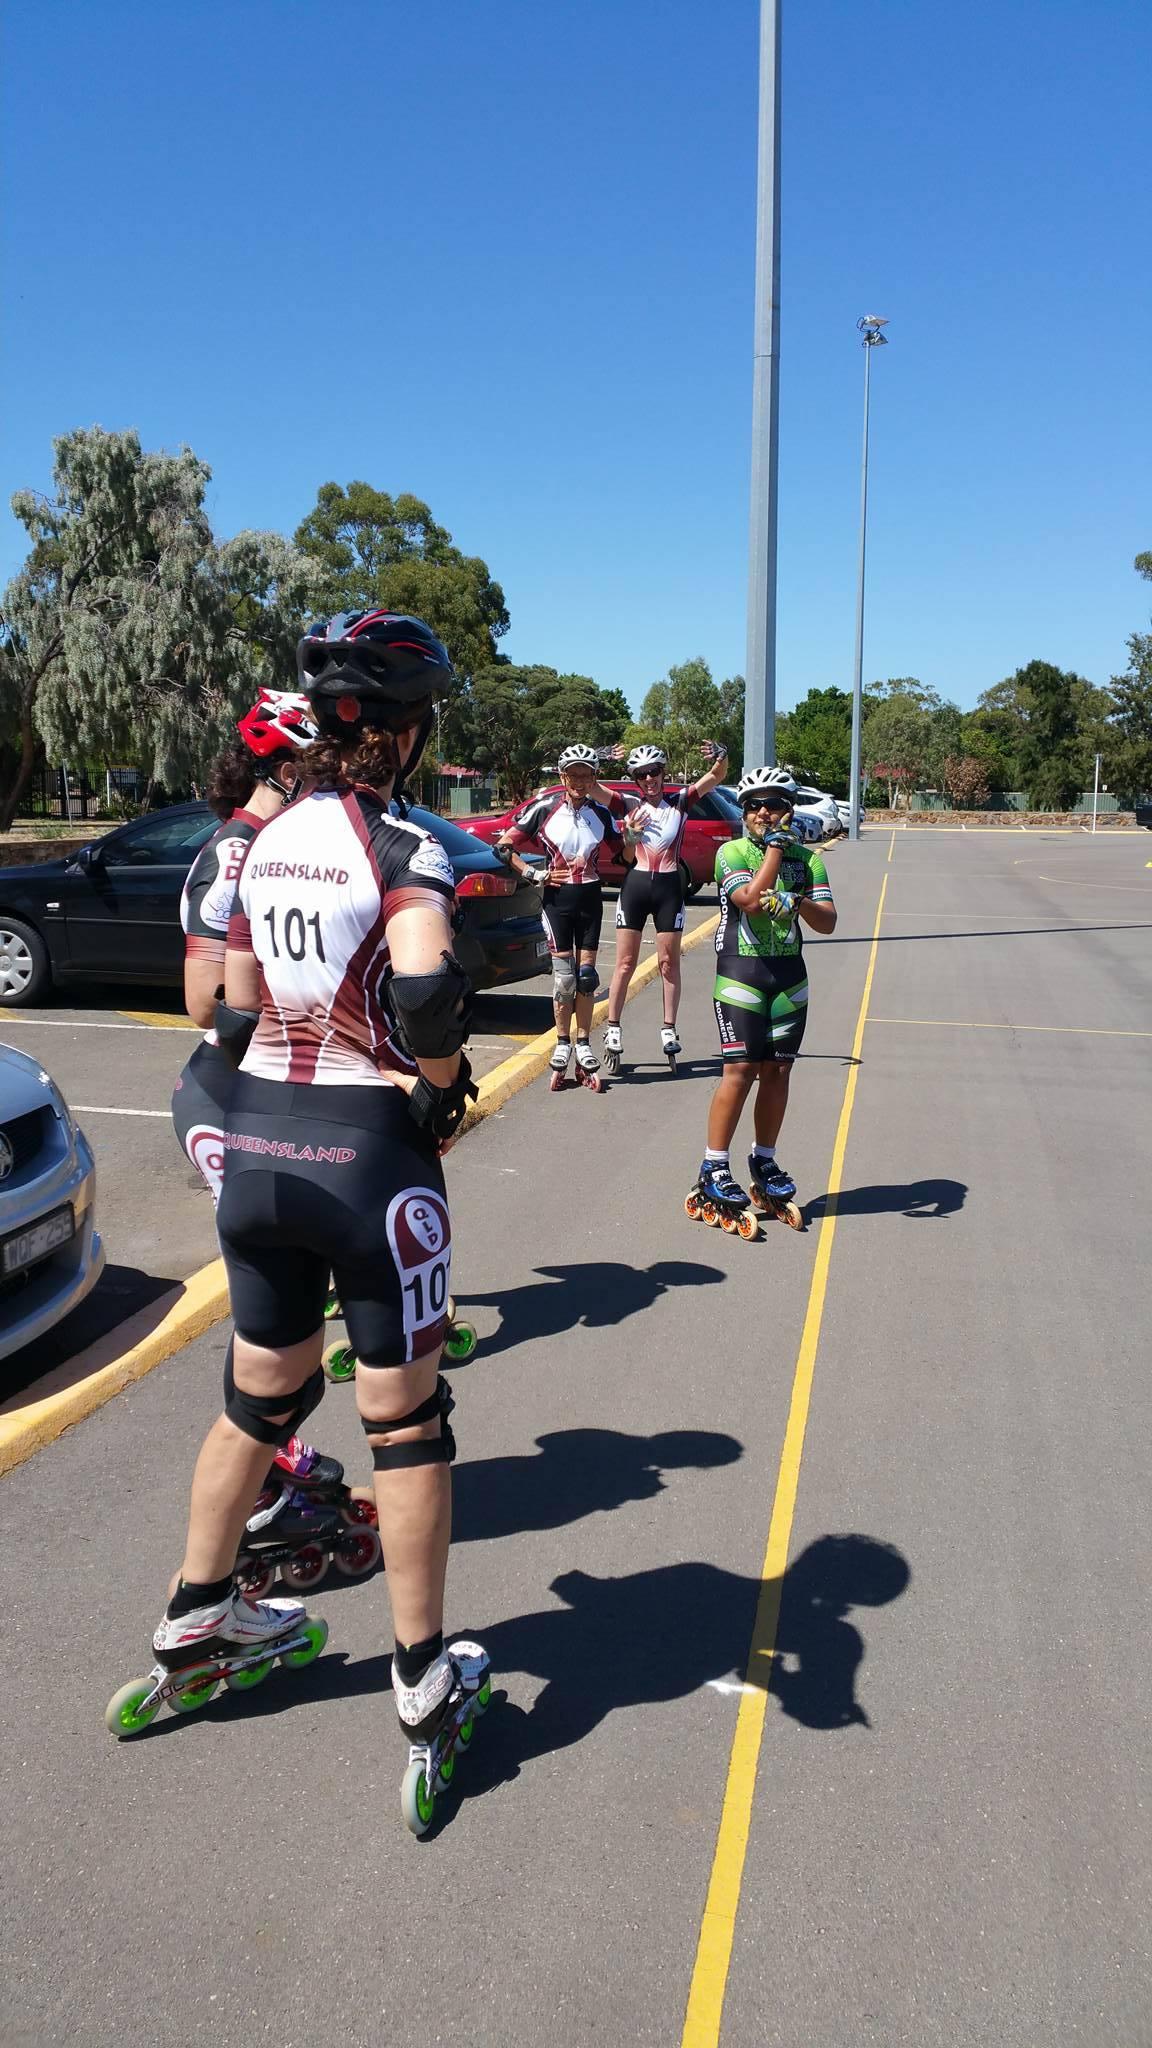 Roller skates queensland - Roller Skates Queensland 2